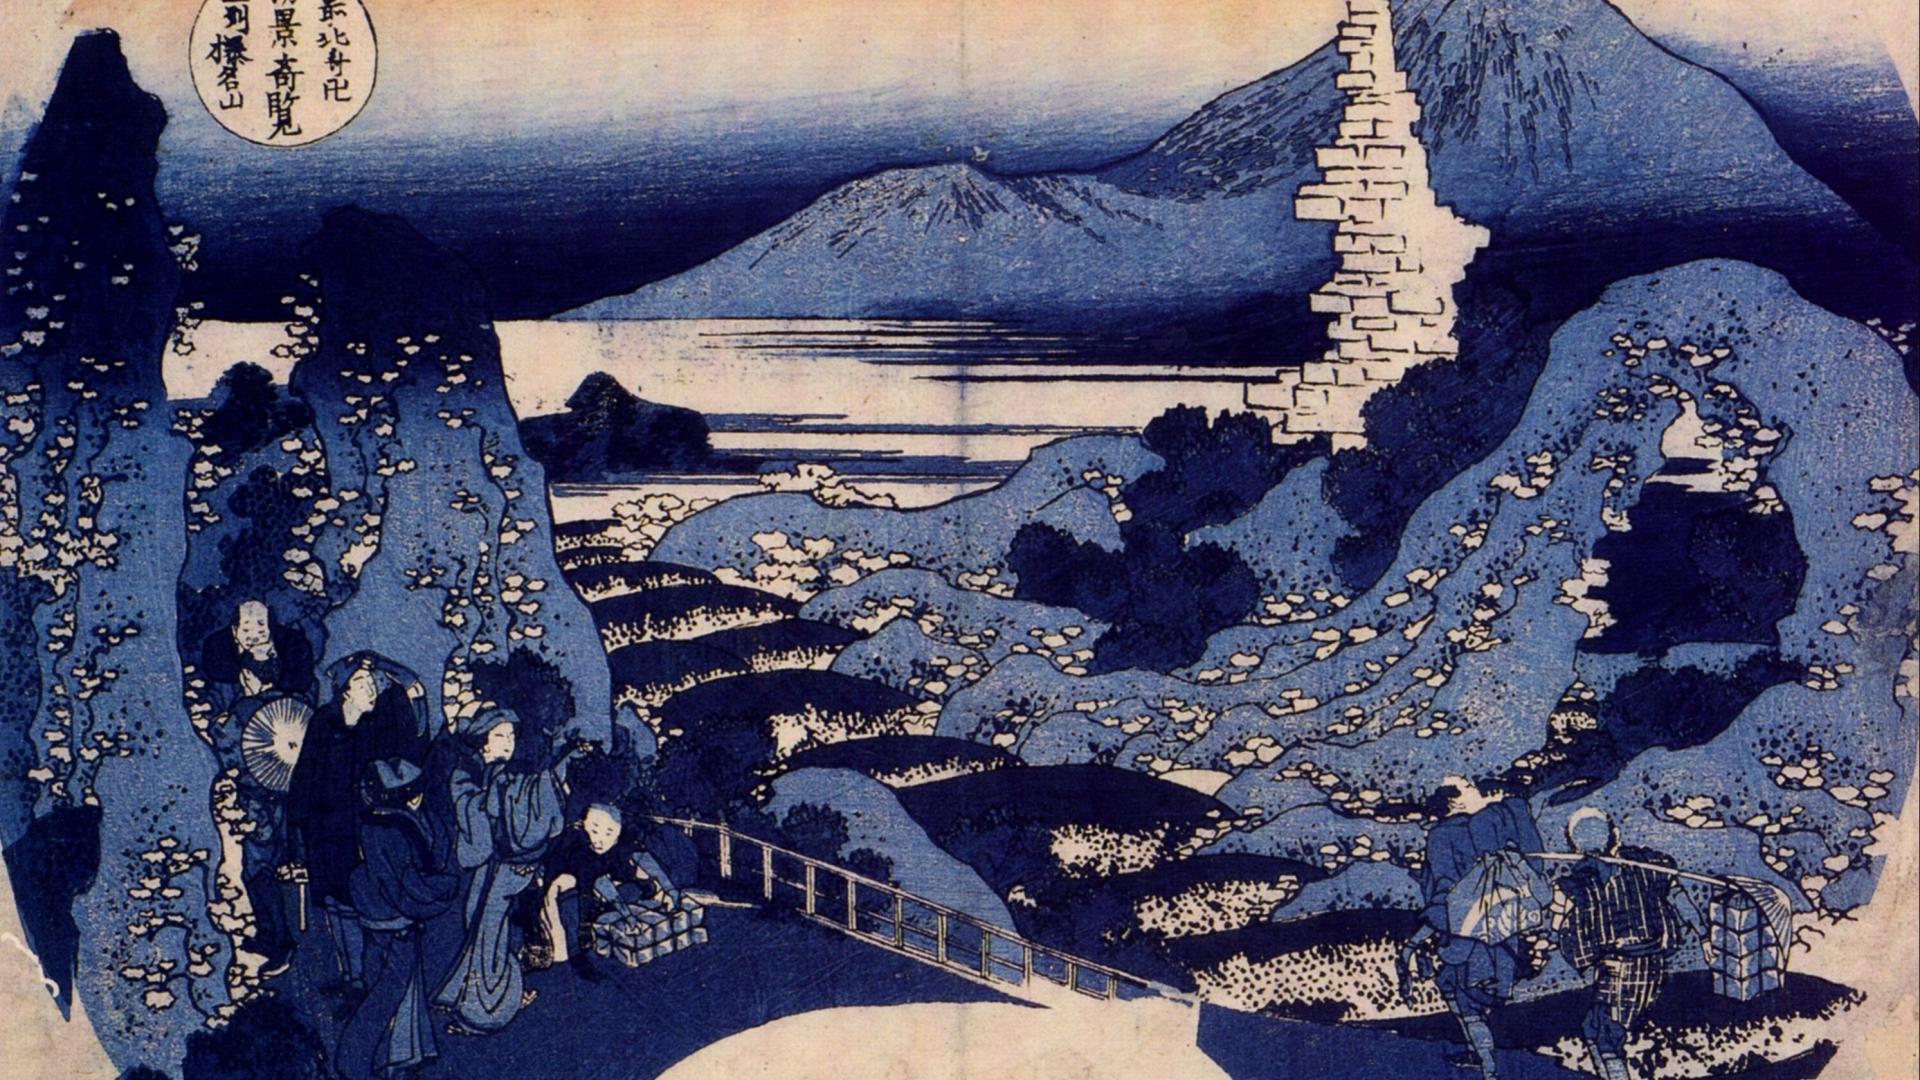 Artwork katsushika hokusai wallpaper 9676 1920x1080